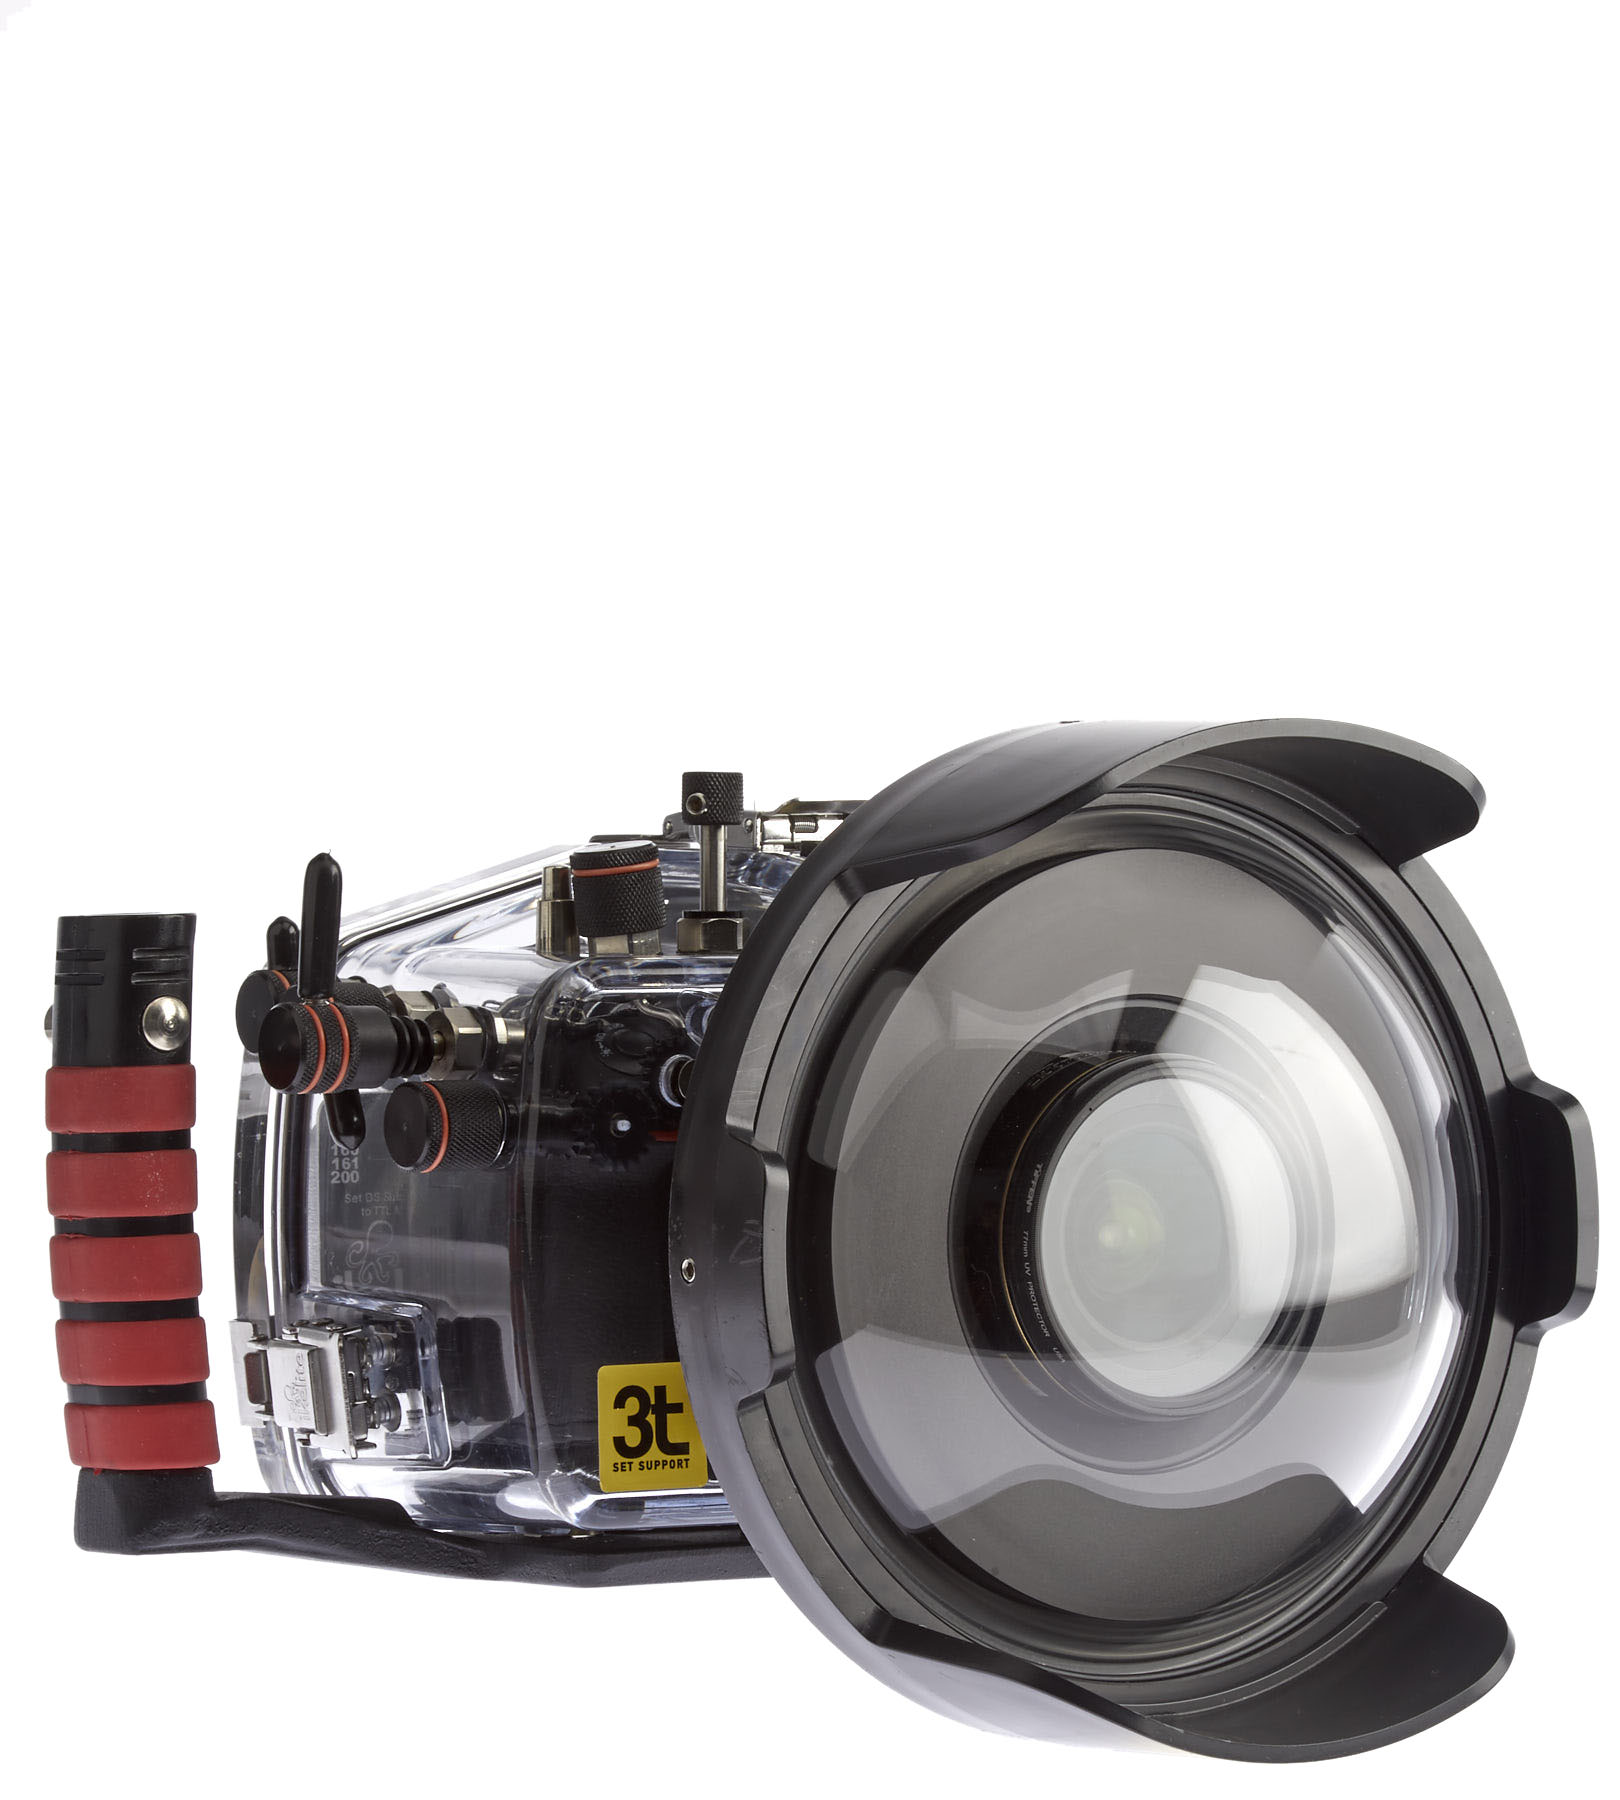 Caixa estanque Ikelite 200 FL para Nikon D810